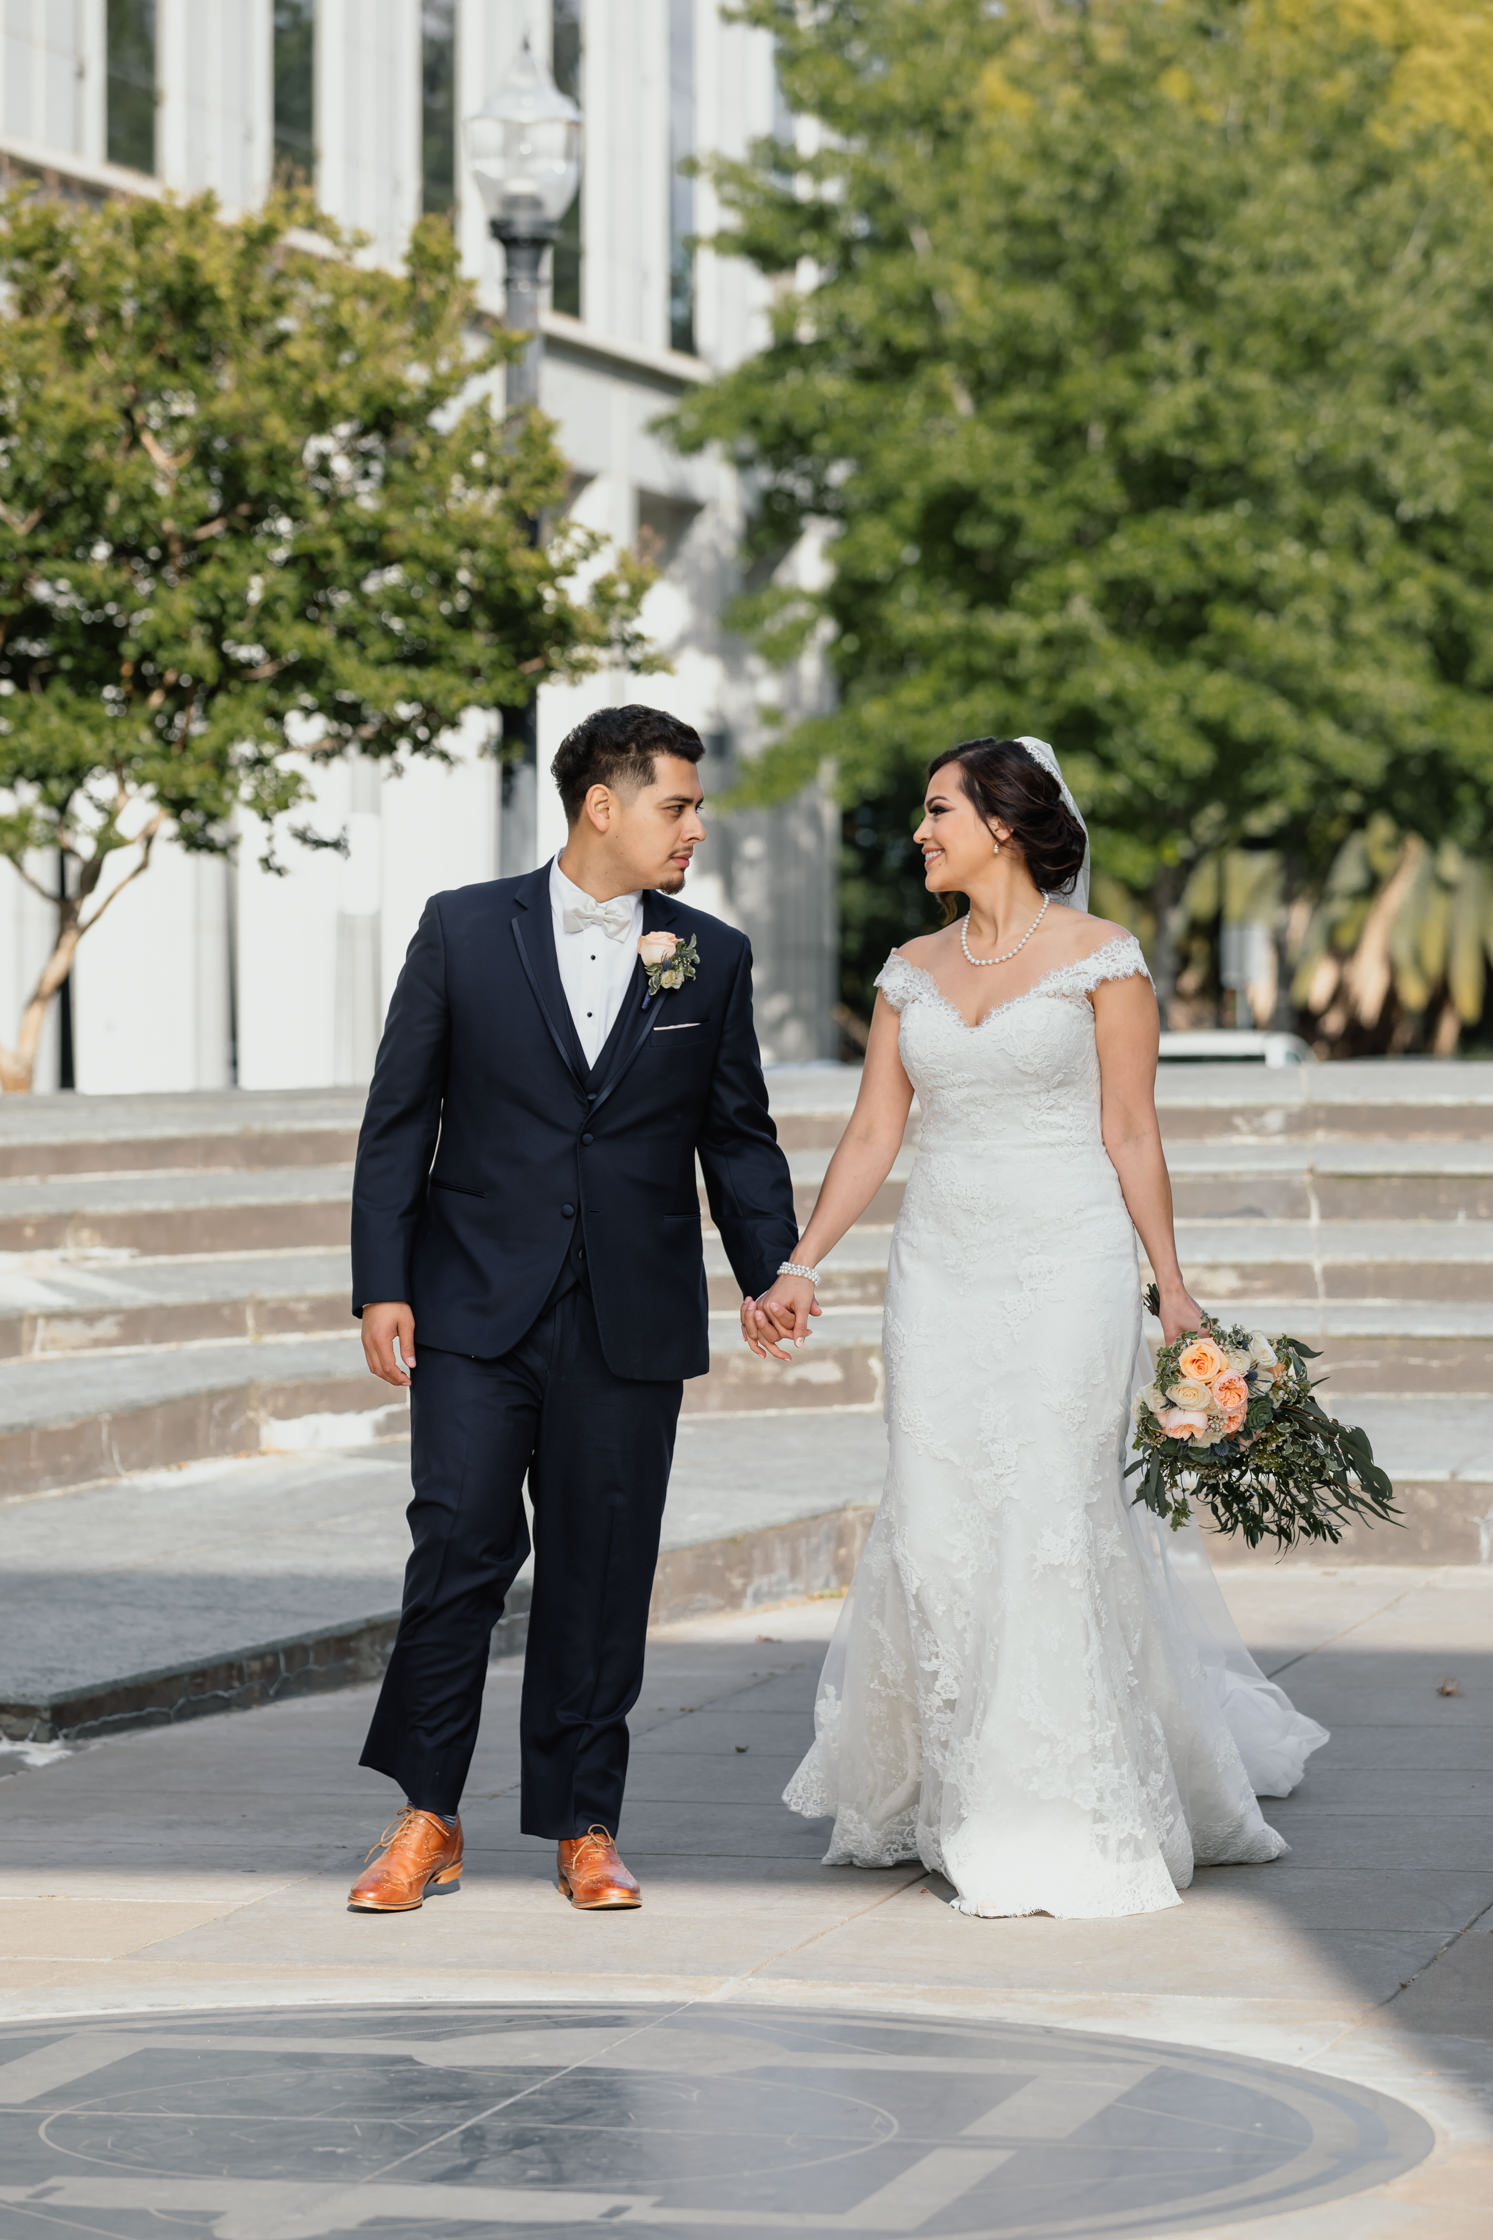 luis_joanna_wedding-64.jpg